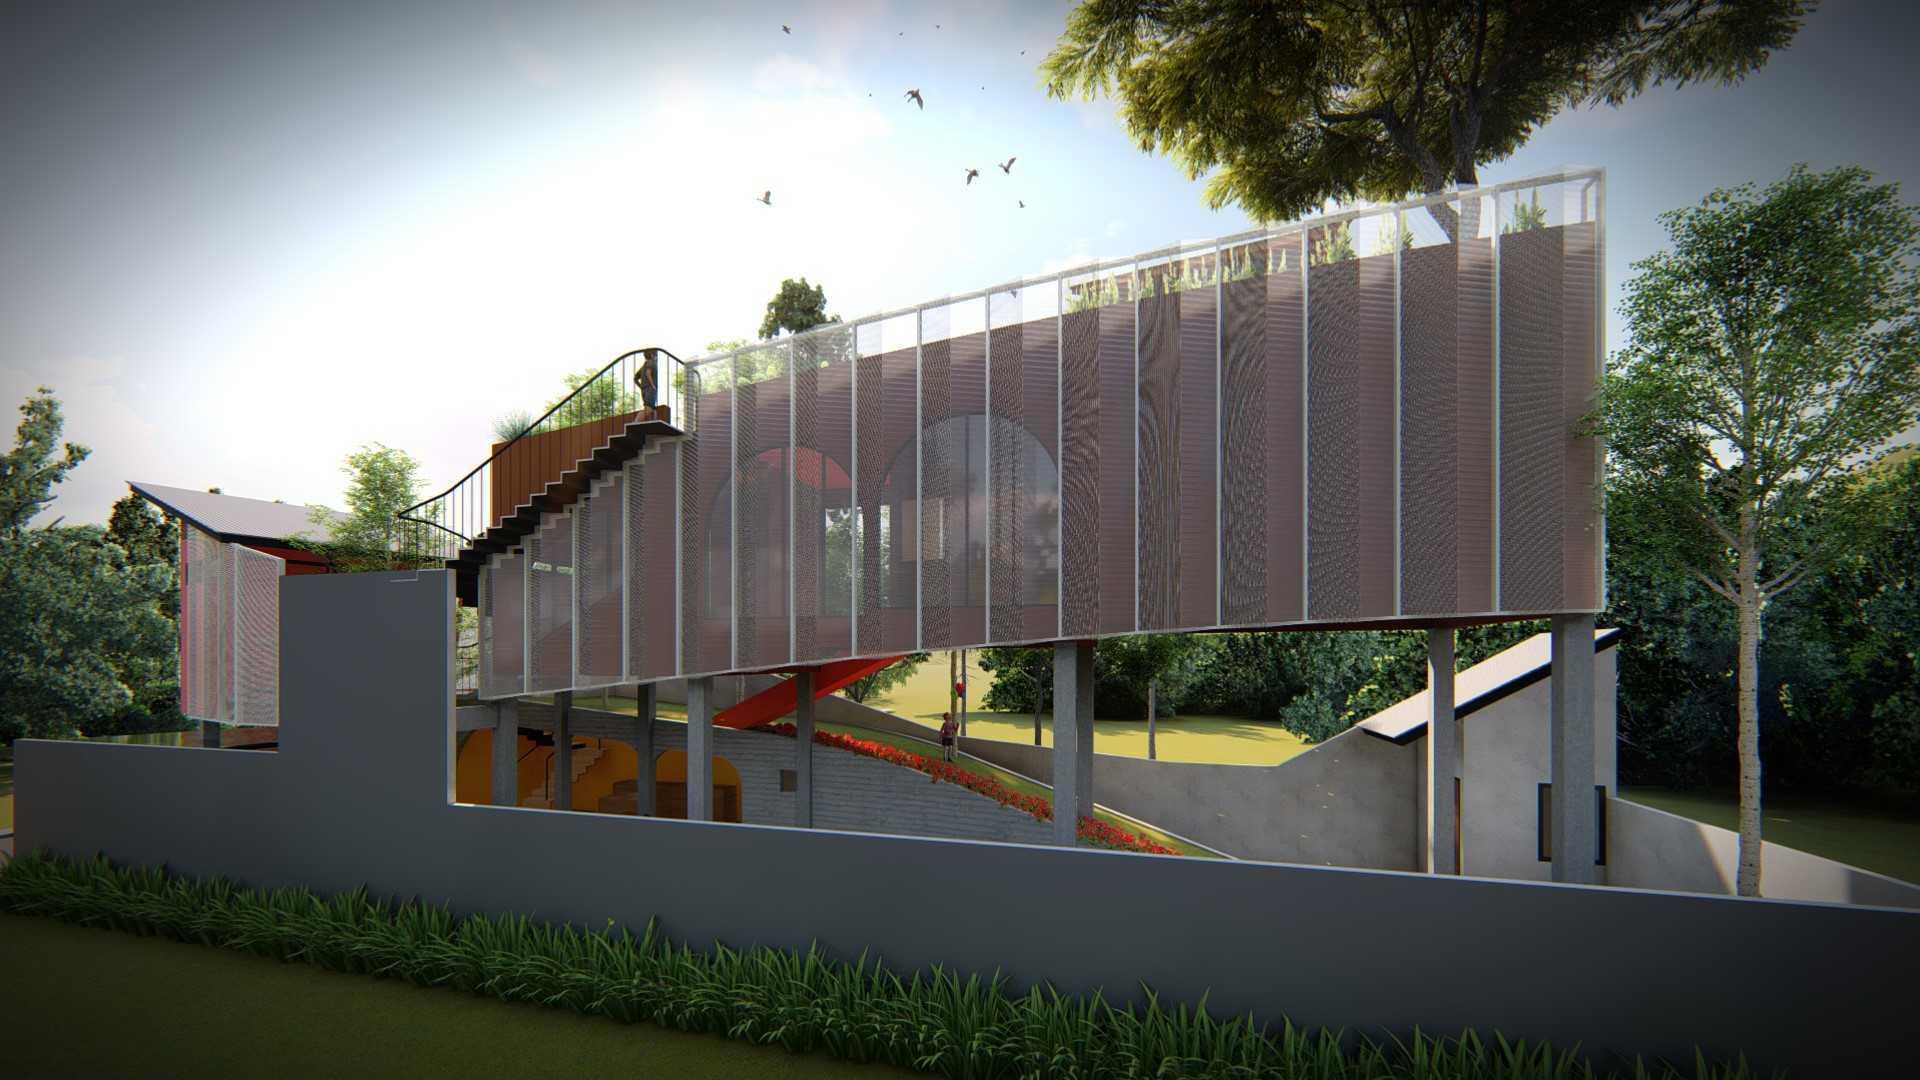 Slight Architect House Sumore Kota Manado, Sulawesi Utara, Indonesia Kota Manado, Sulawesi Utara, Indonesia Slight-Architect-House-Sumore  122819